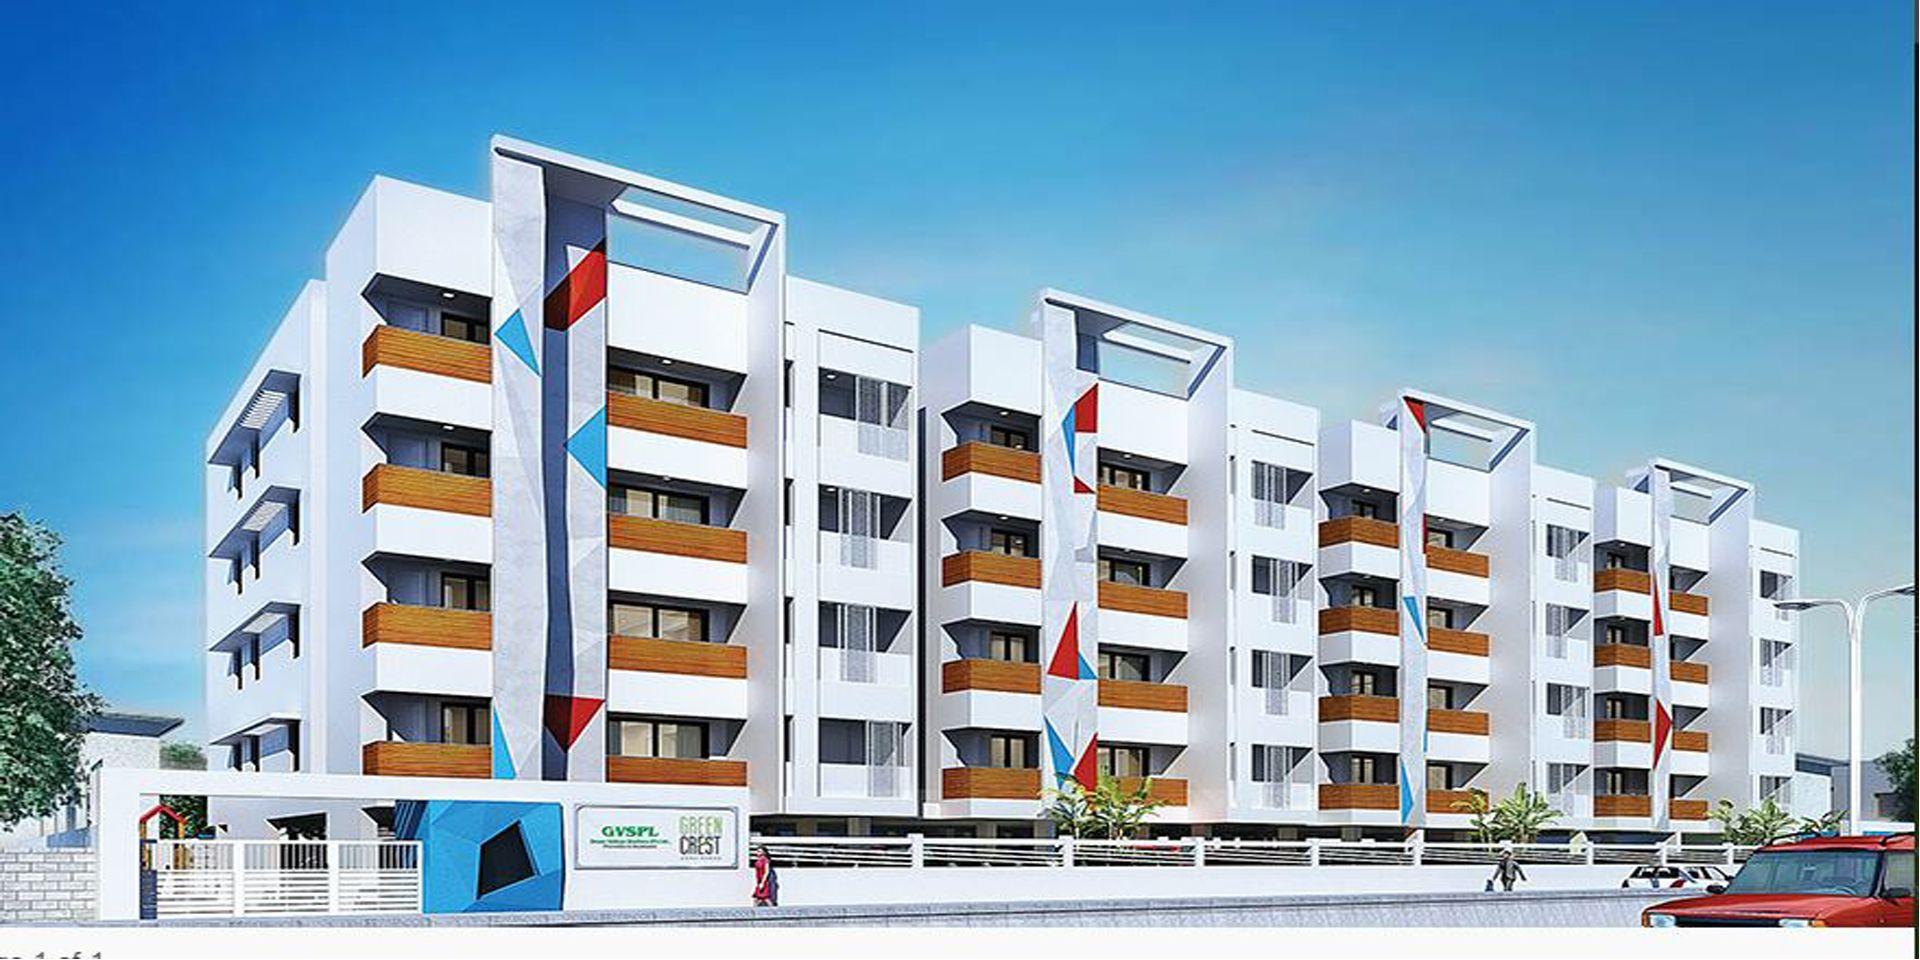 3 BHK Apartment in Anna Nagar Apartments for sale